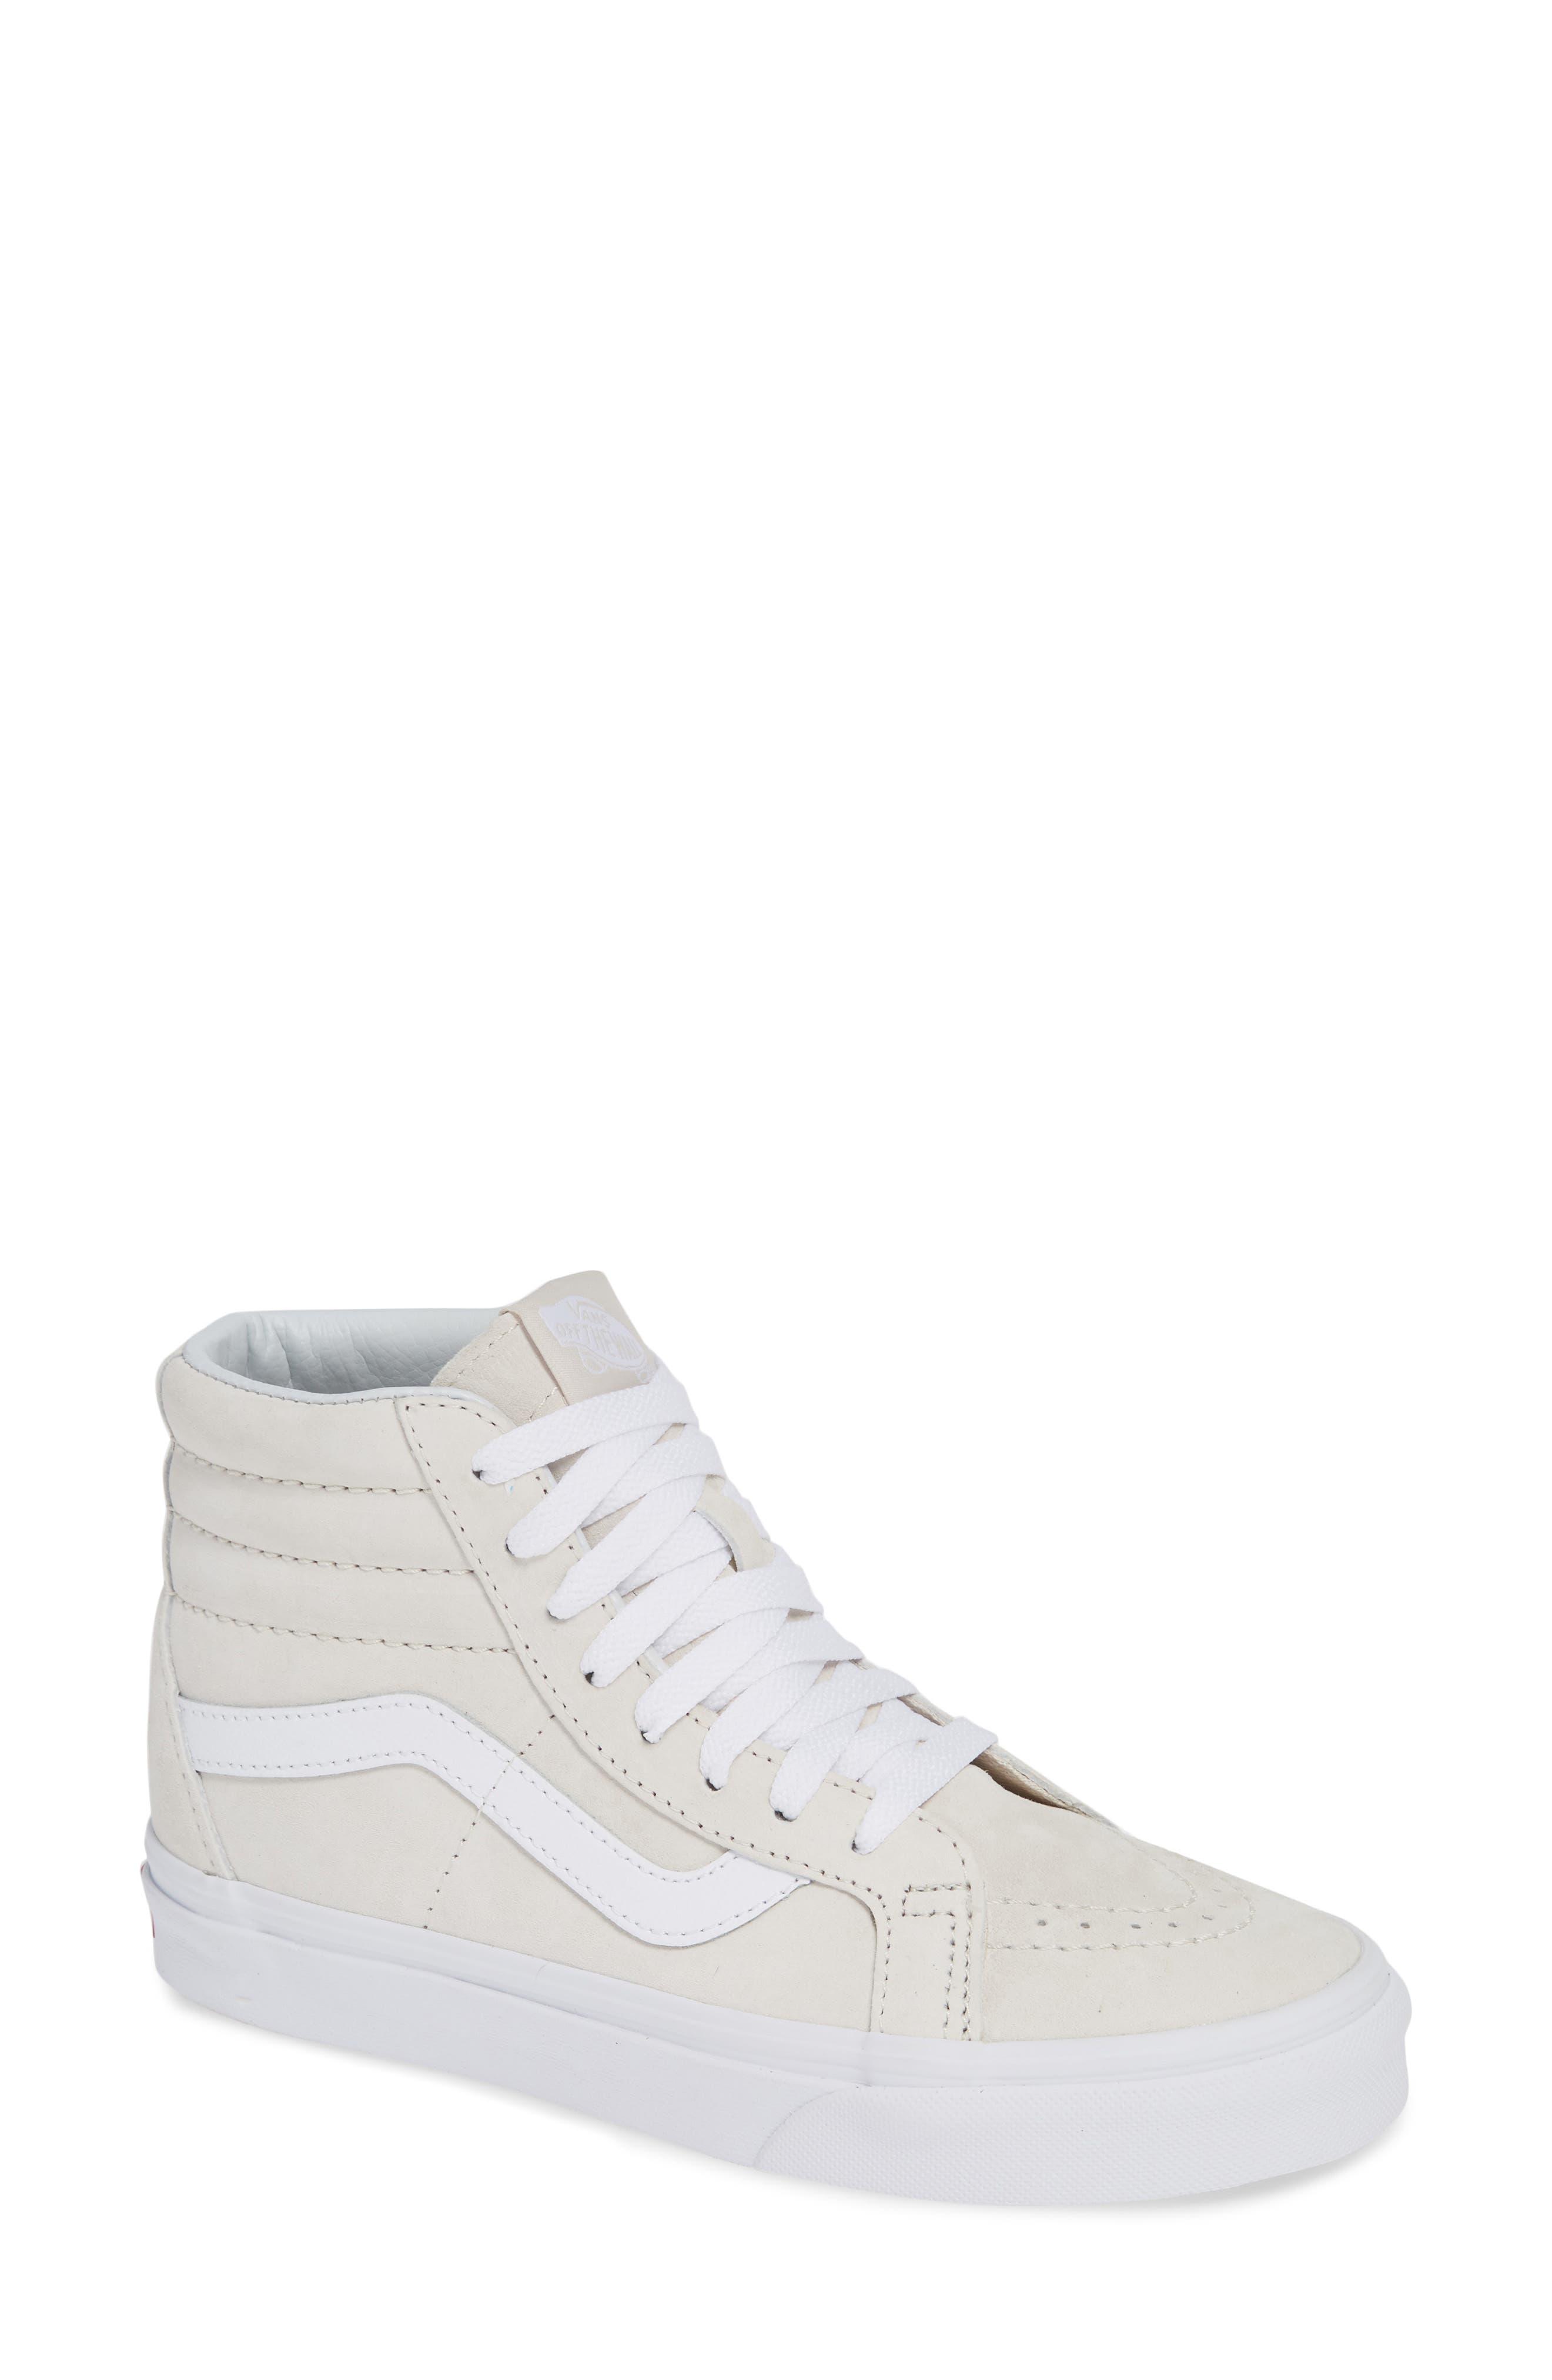 Sk8-Hi Reissue Sneaker,                             Main thumbnail 1, color,                             270